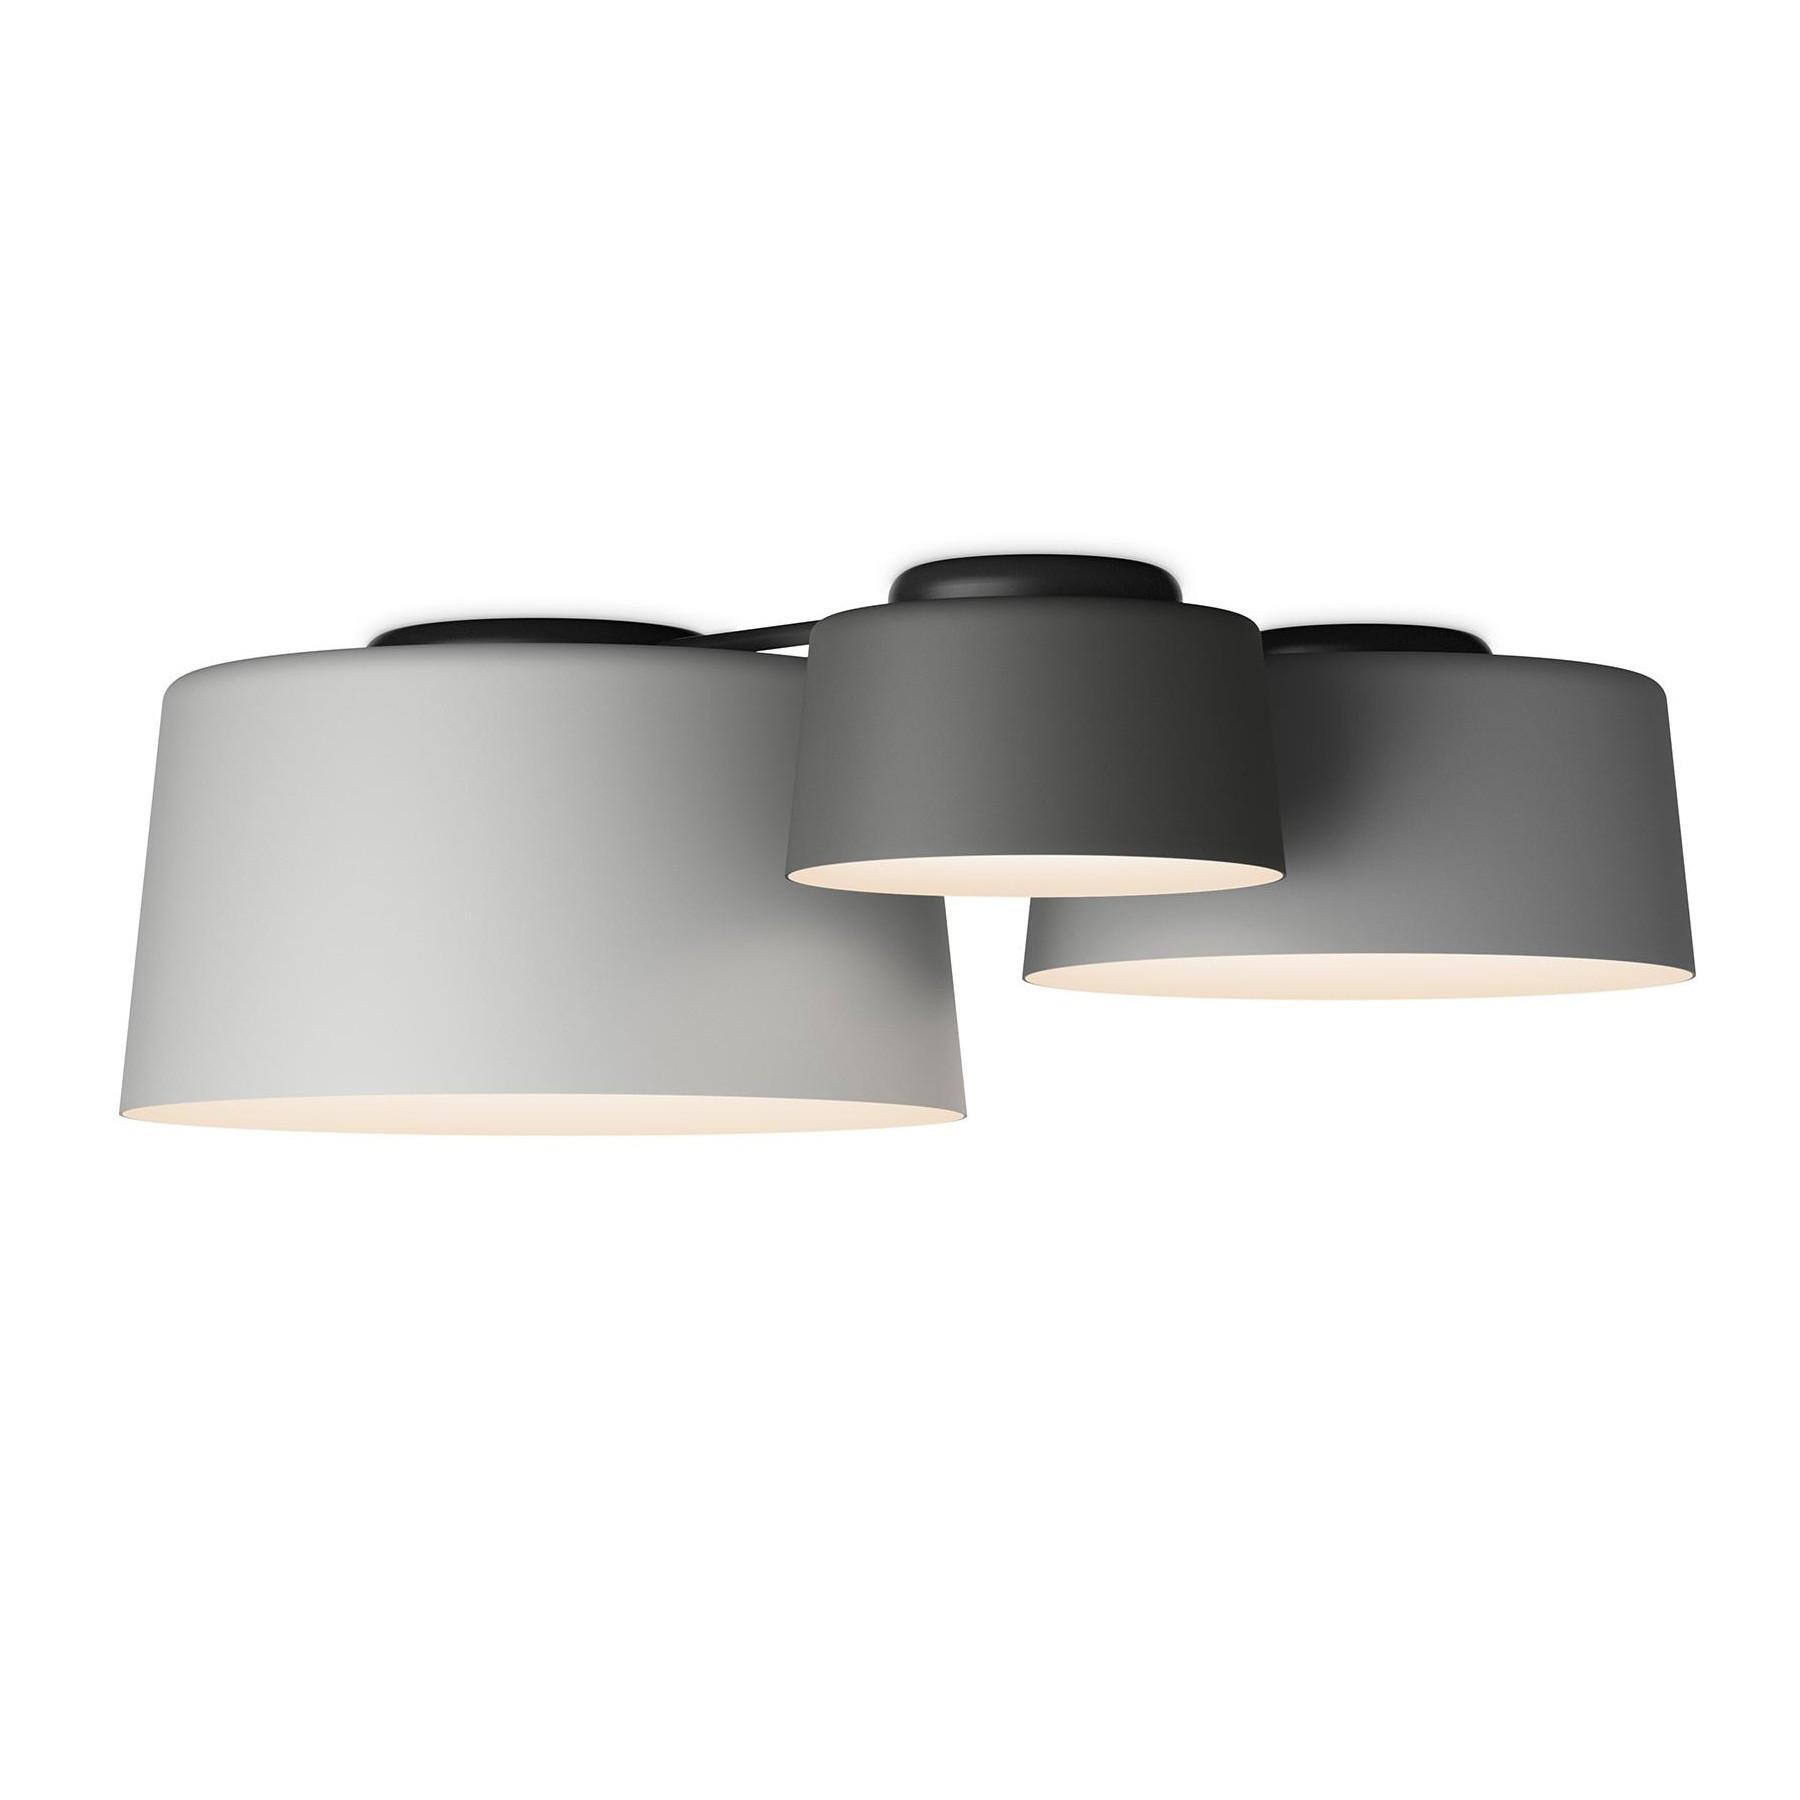 Vibia 6115 Led Ceiling Lamp